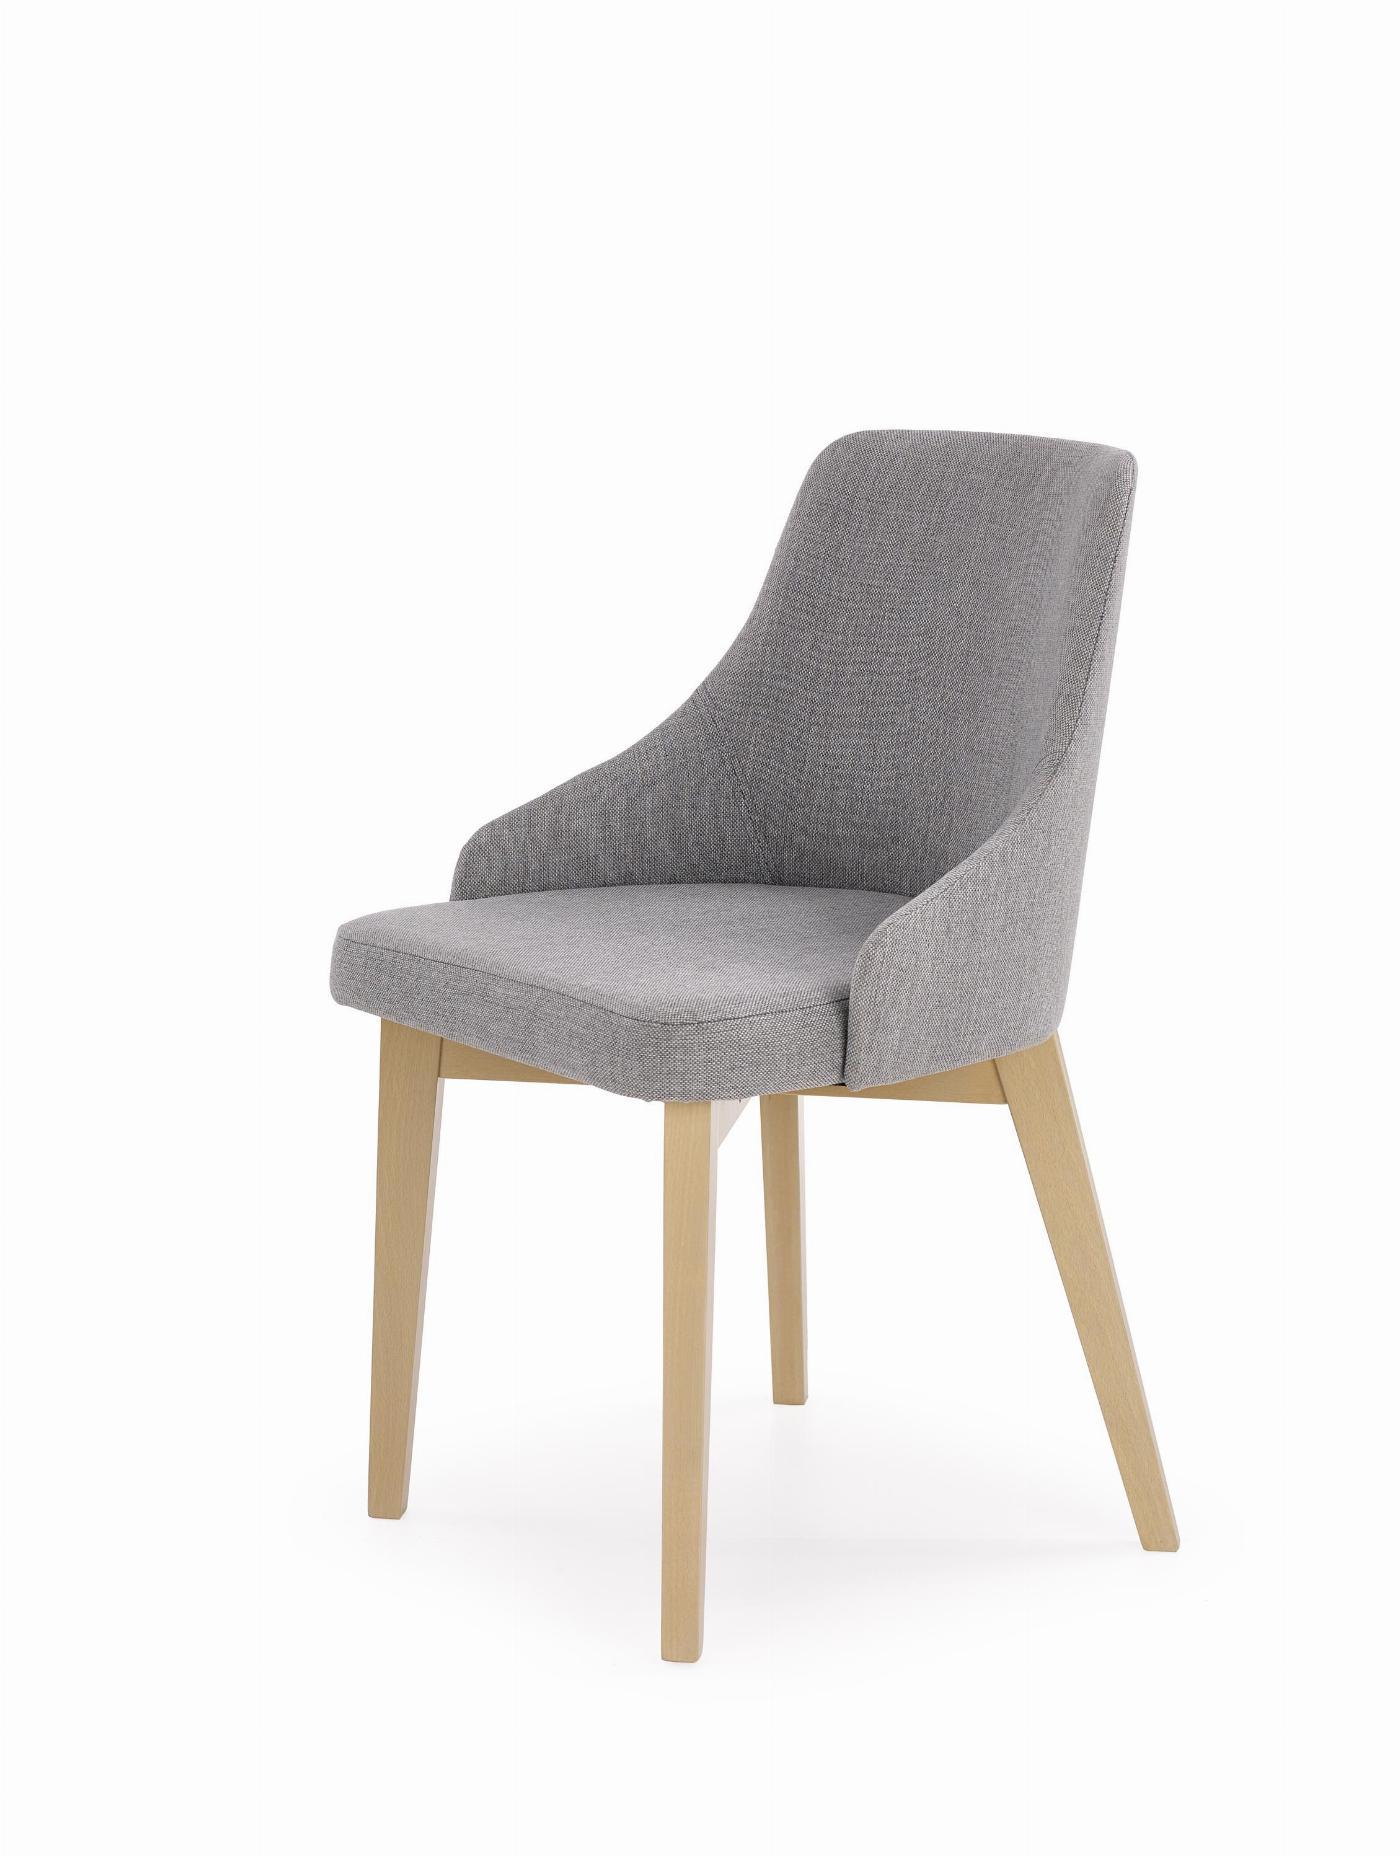 TOLEDO krzesło dąb sonoma / tap. Inari 91 (1p=1szt)